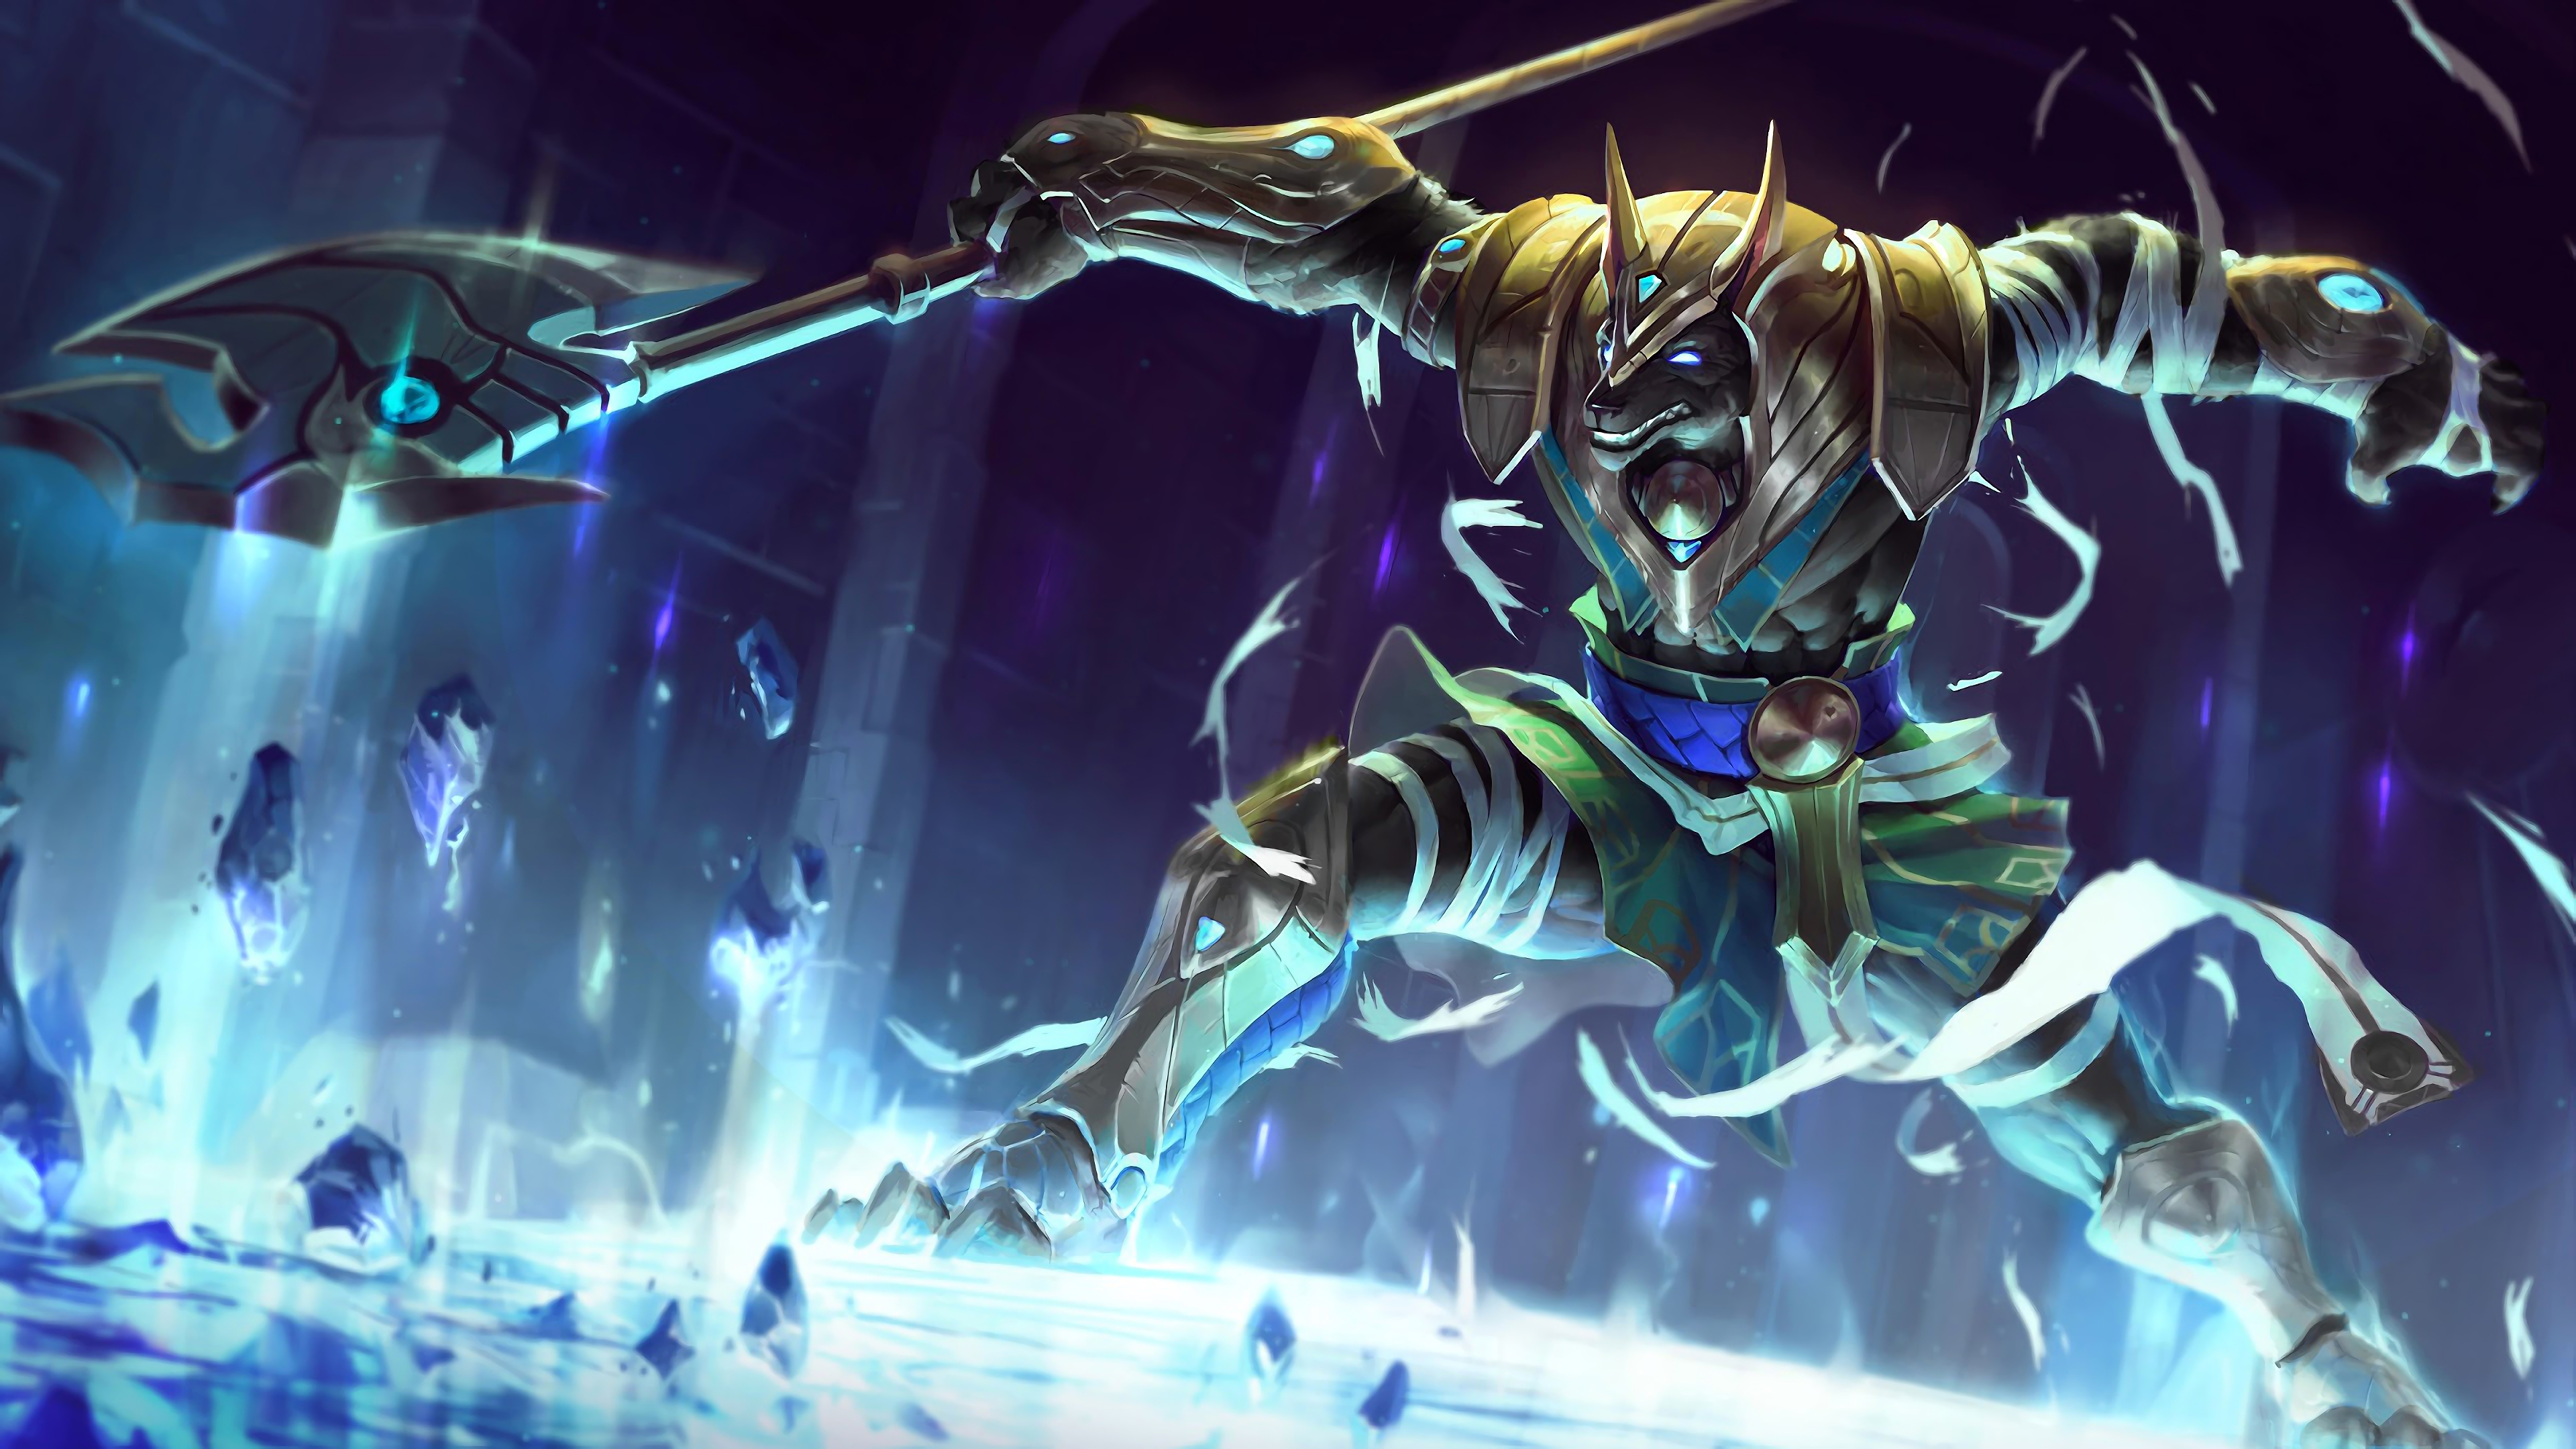 nasus lol splash art league of legends 1574099400 - Nasus LoL Splash Art League of Legends - Nasus, league of legends